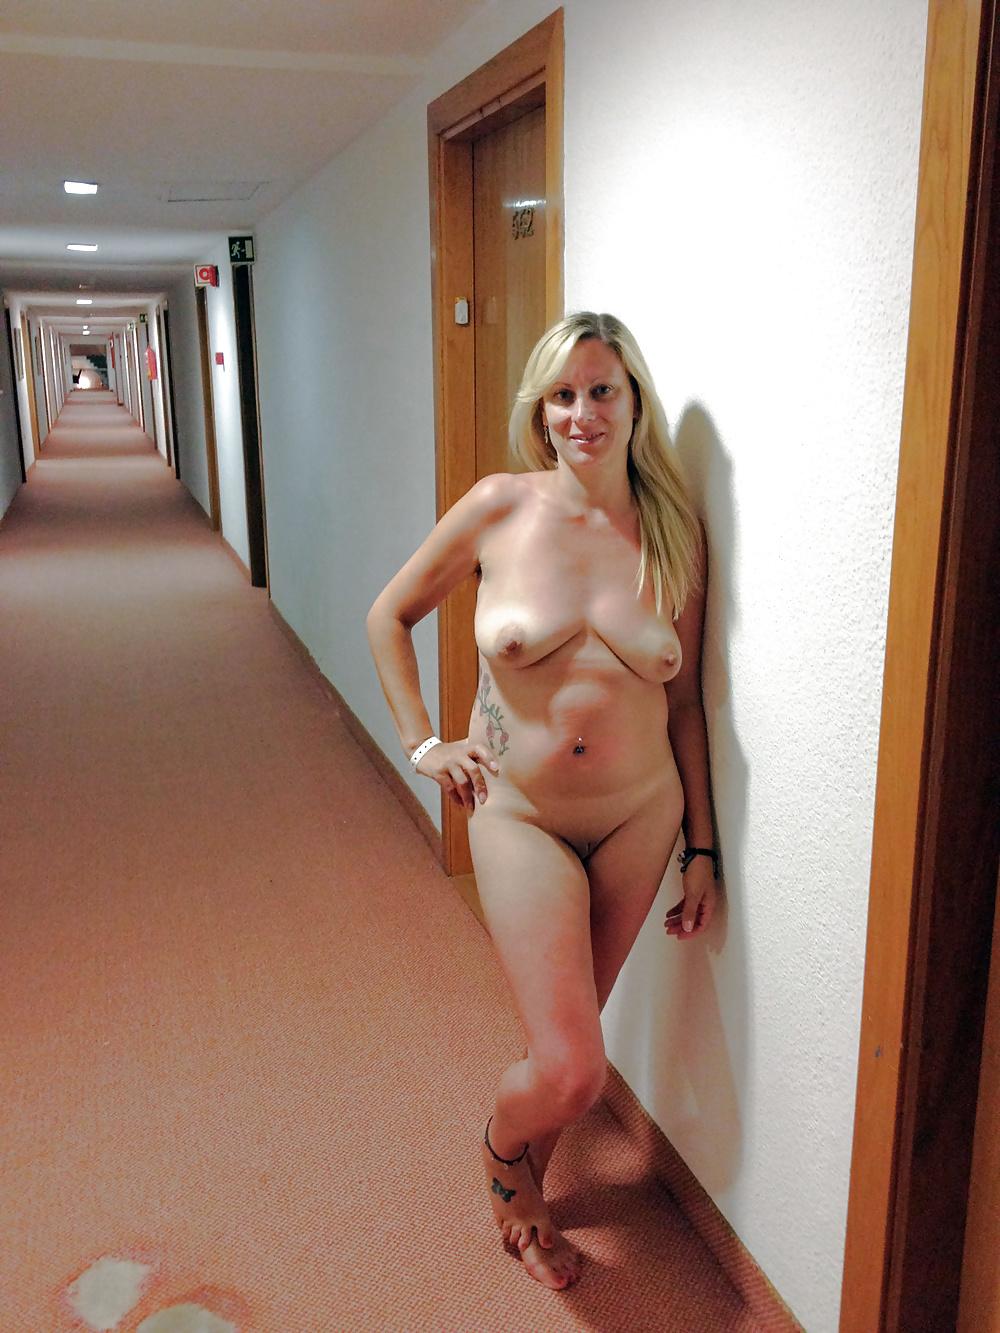 fucks-pornstars-amateur-hotel-mature-naked-hot-porn